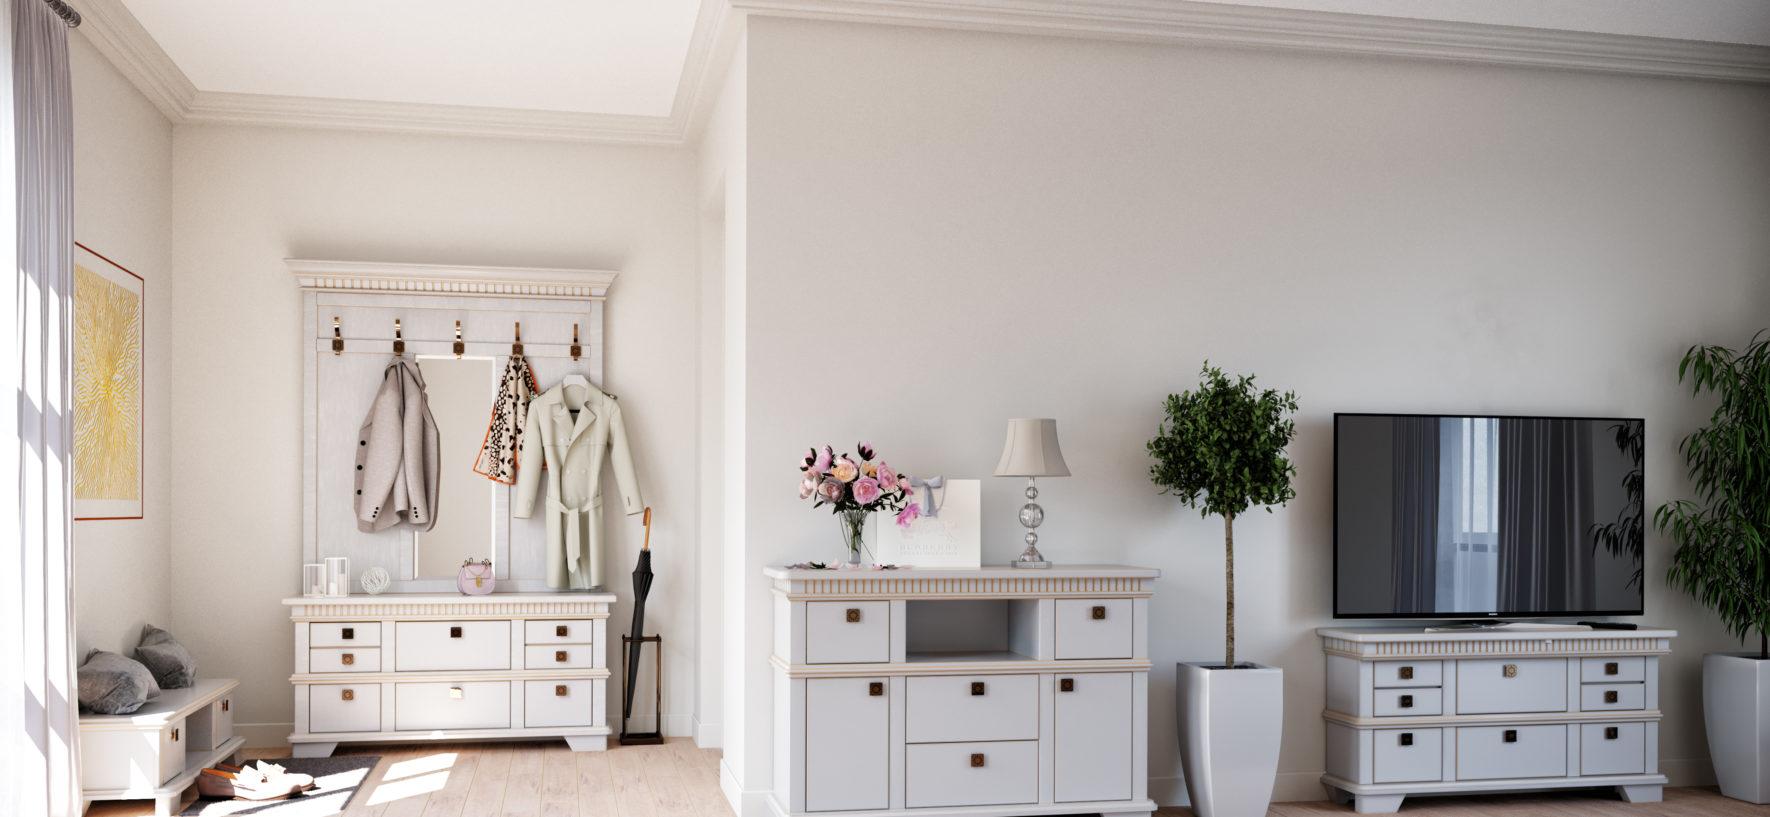 Особенности мебели из массива дуба